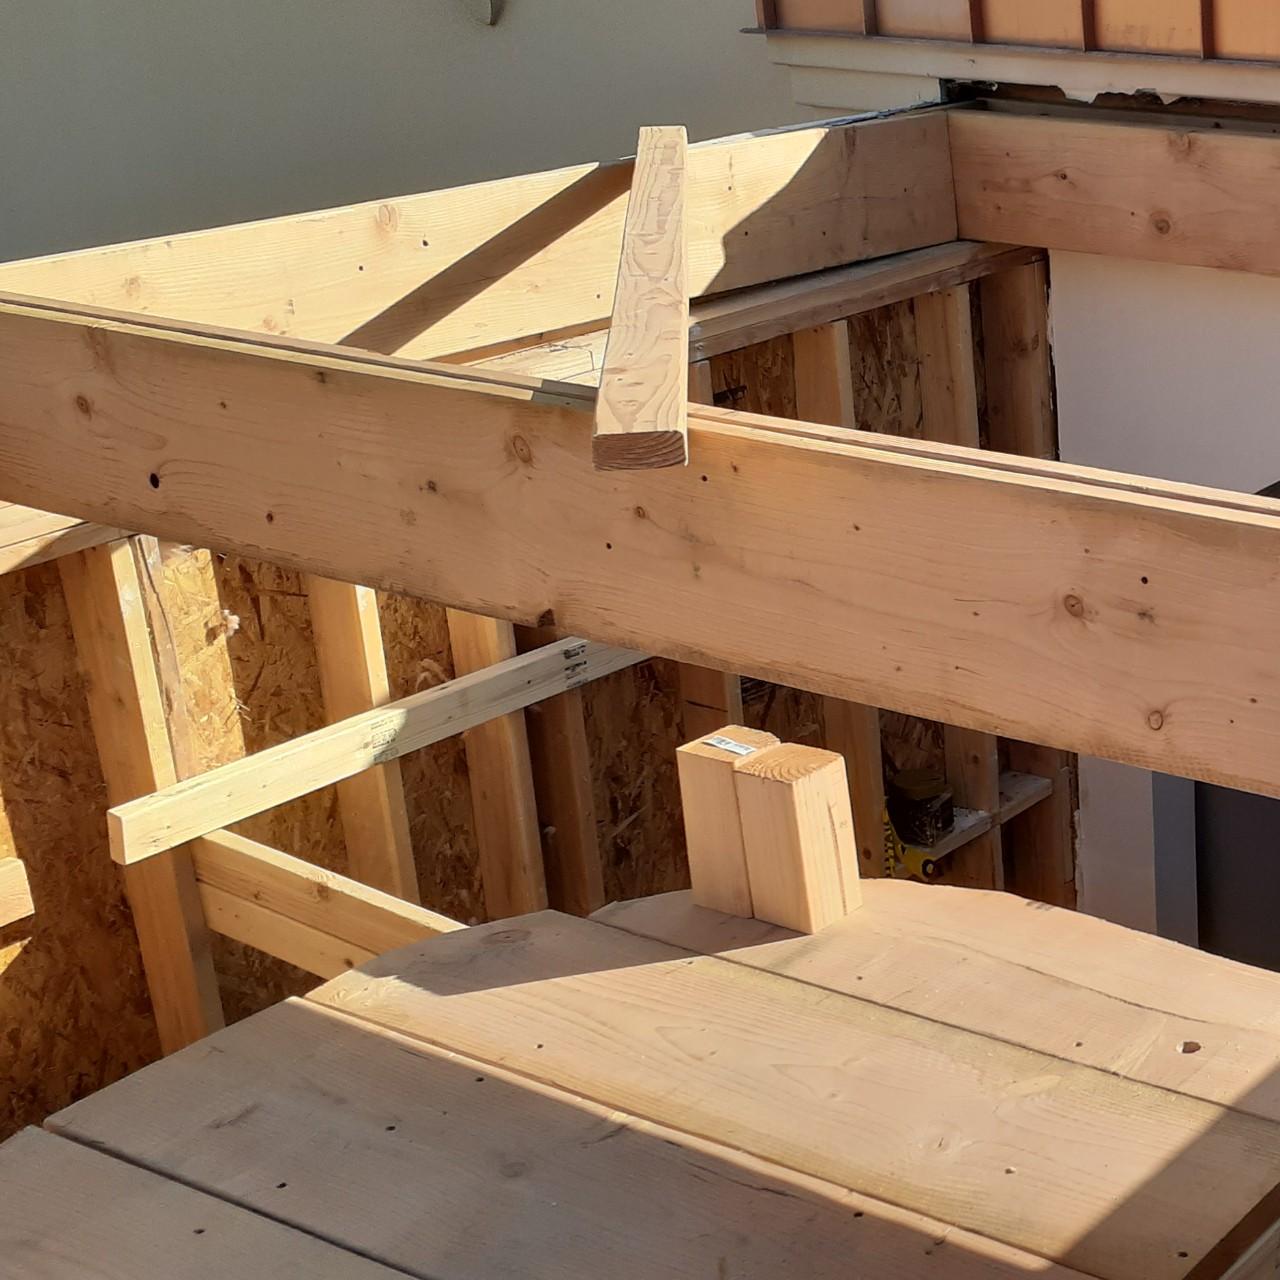 carpentry-wood-framing-second-floor-home-addition--framing-56